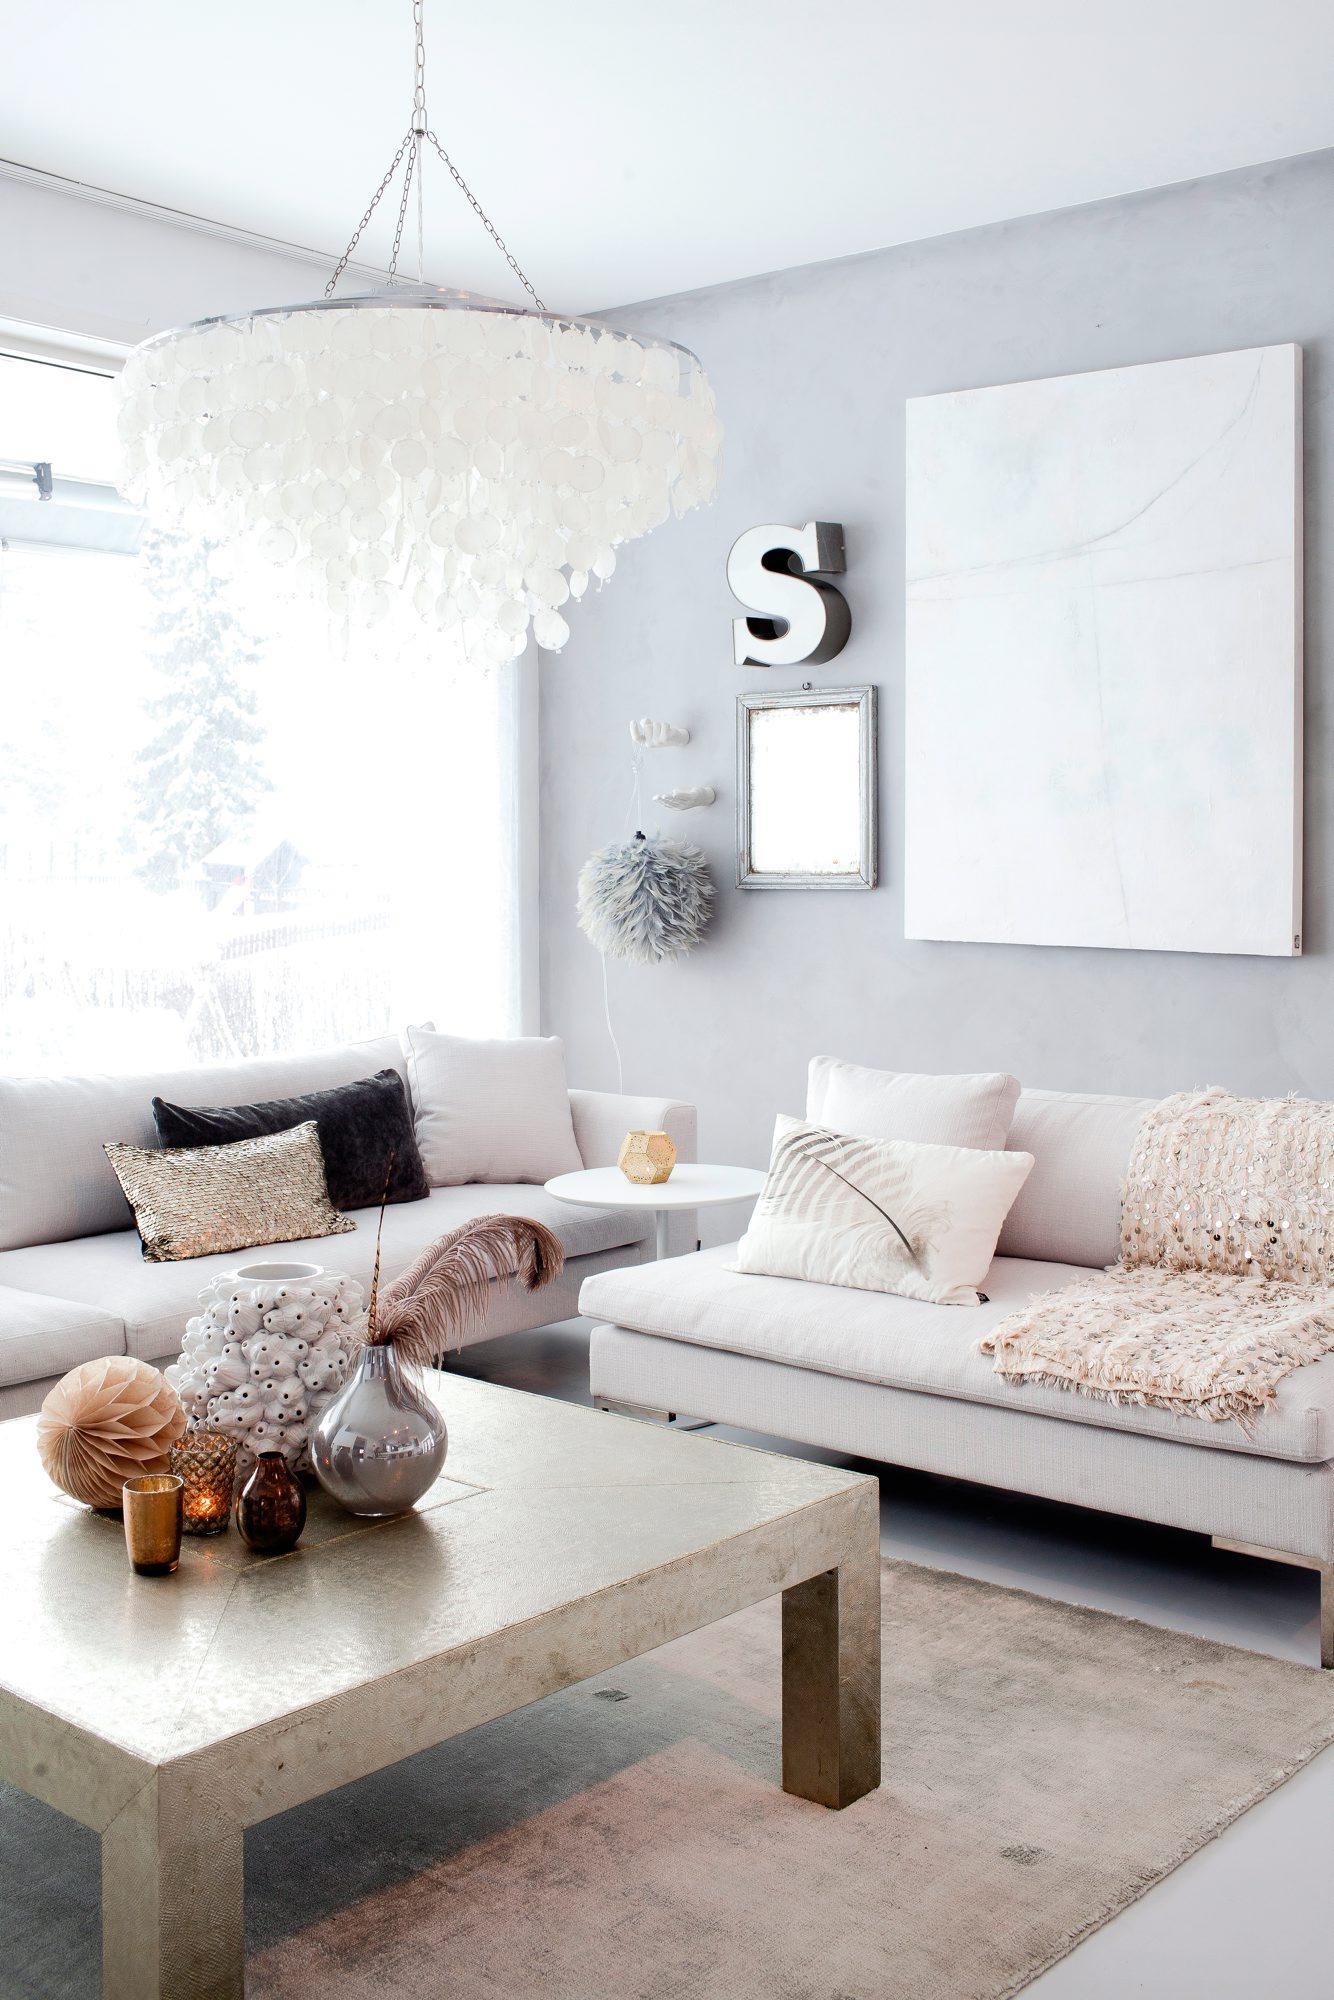 Elin Sveen i Ygg & Lyng har malt veggen over sofaen med kalkmaling i ...